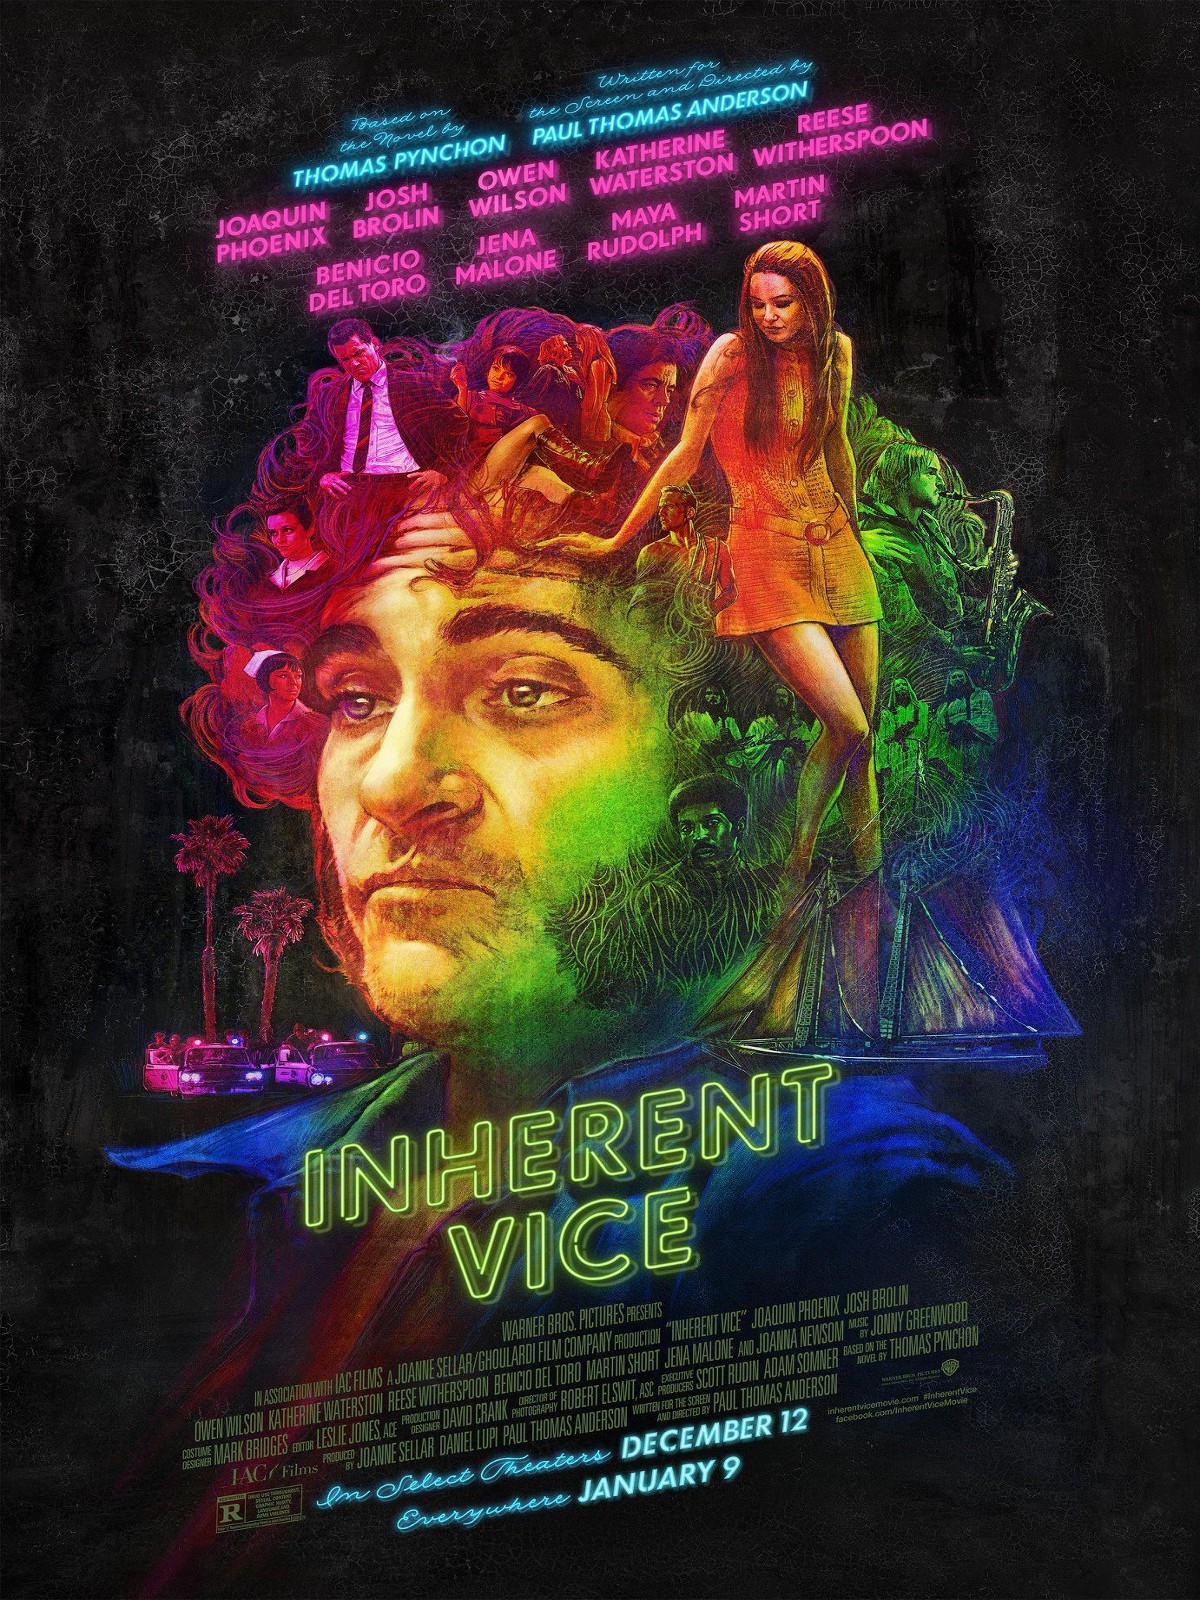 inherent vice dvdtoile c fr web 4 acsta net